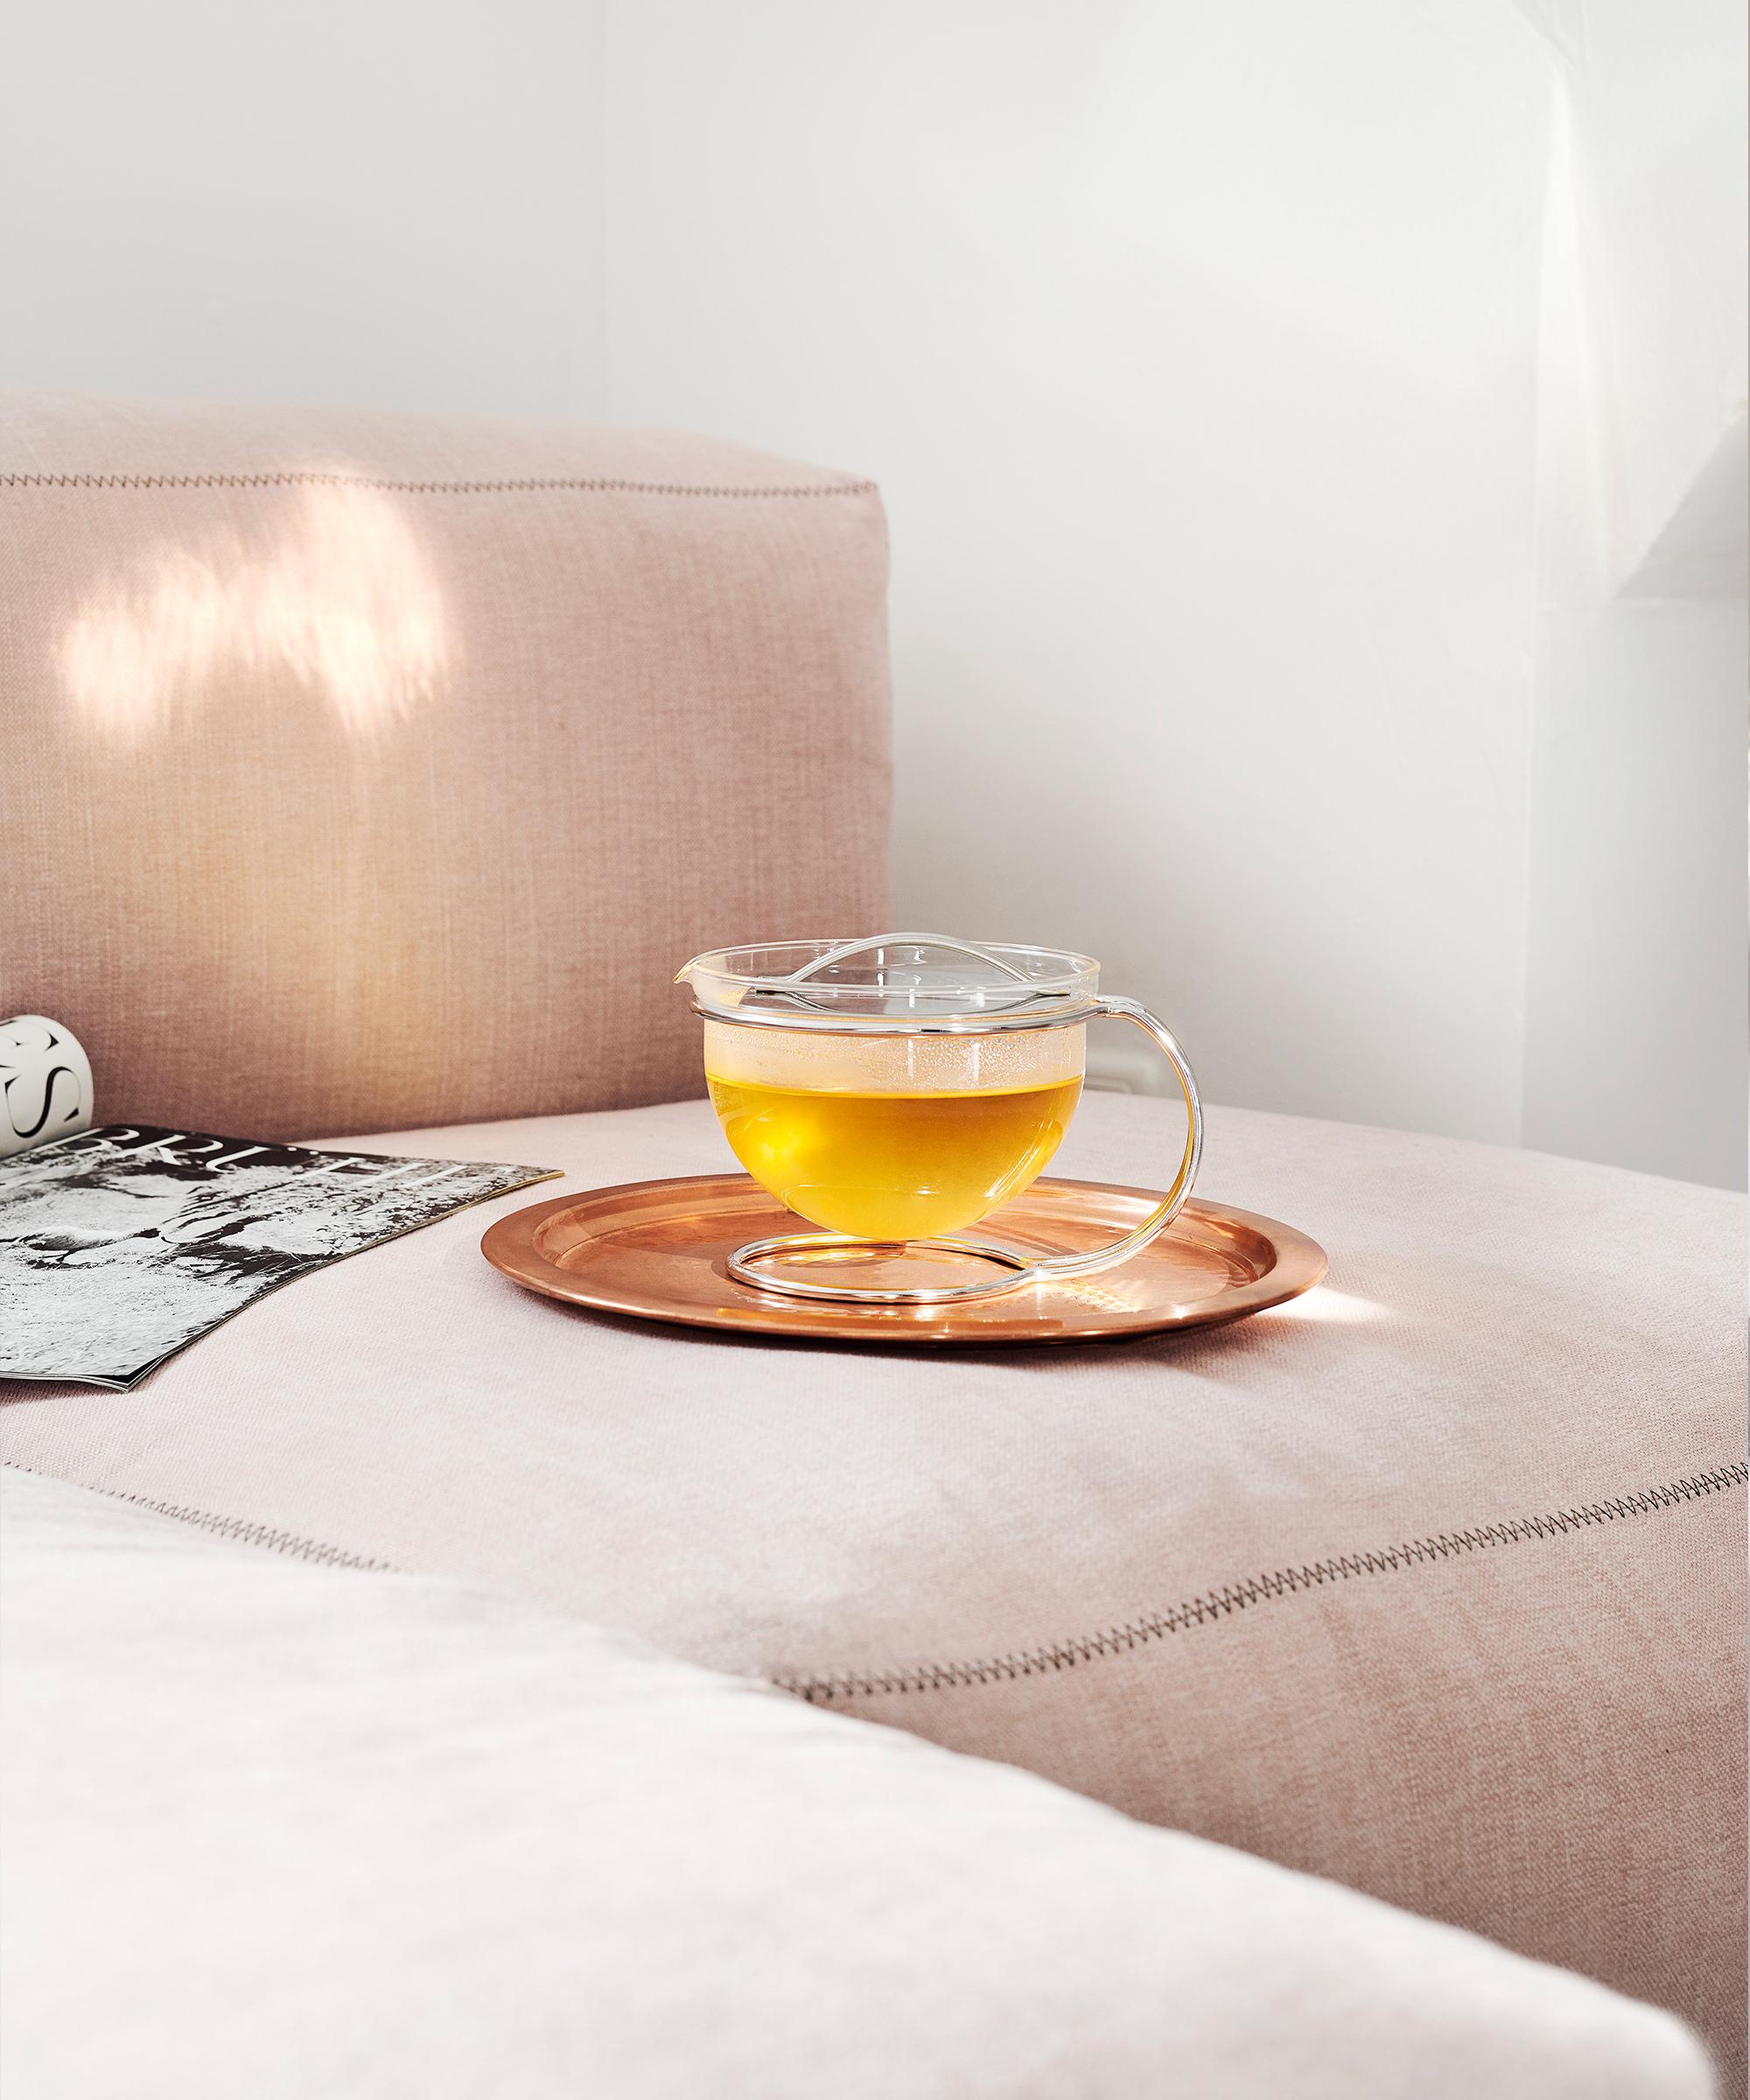 44222 Mono Filio Teekanne Teapot 02